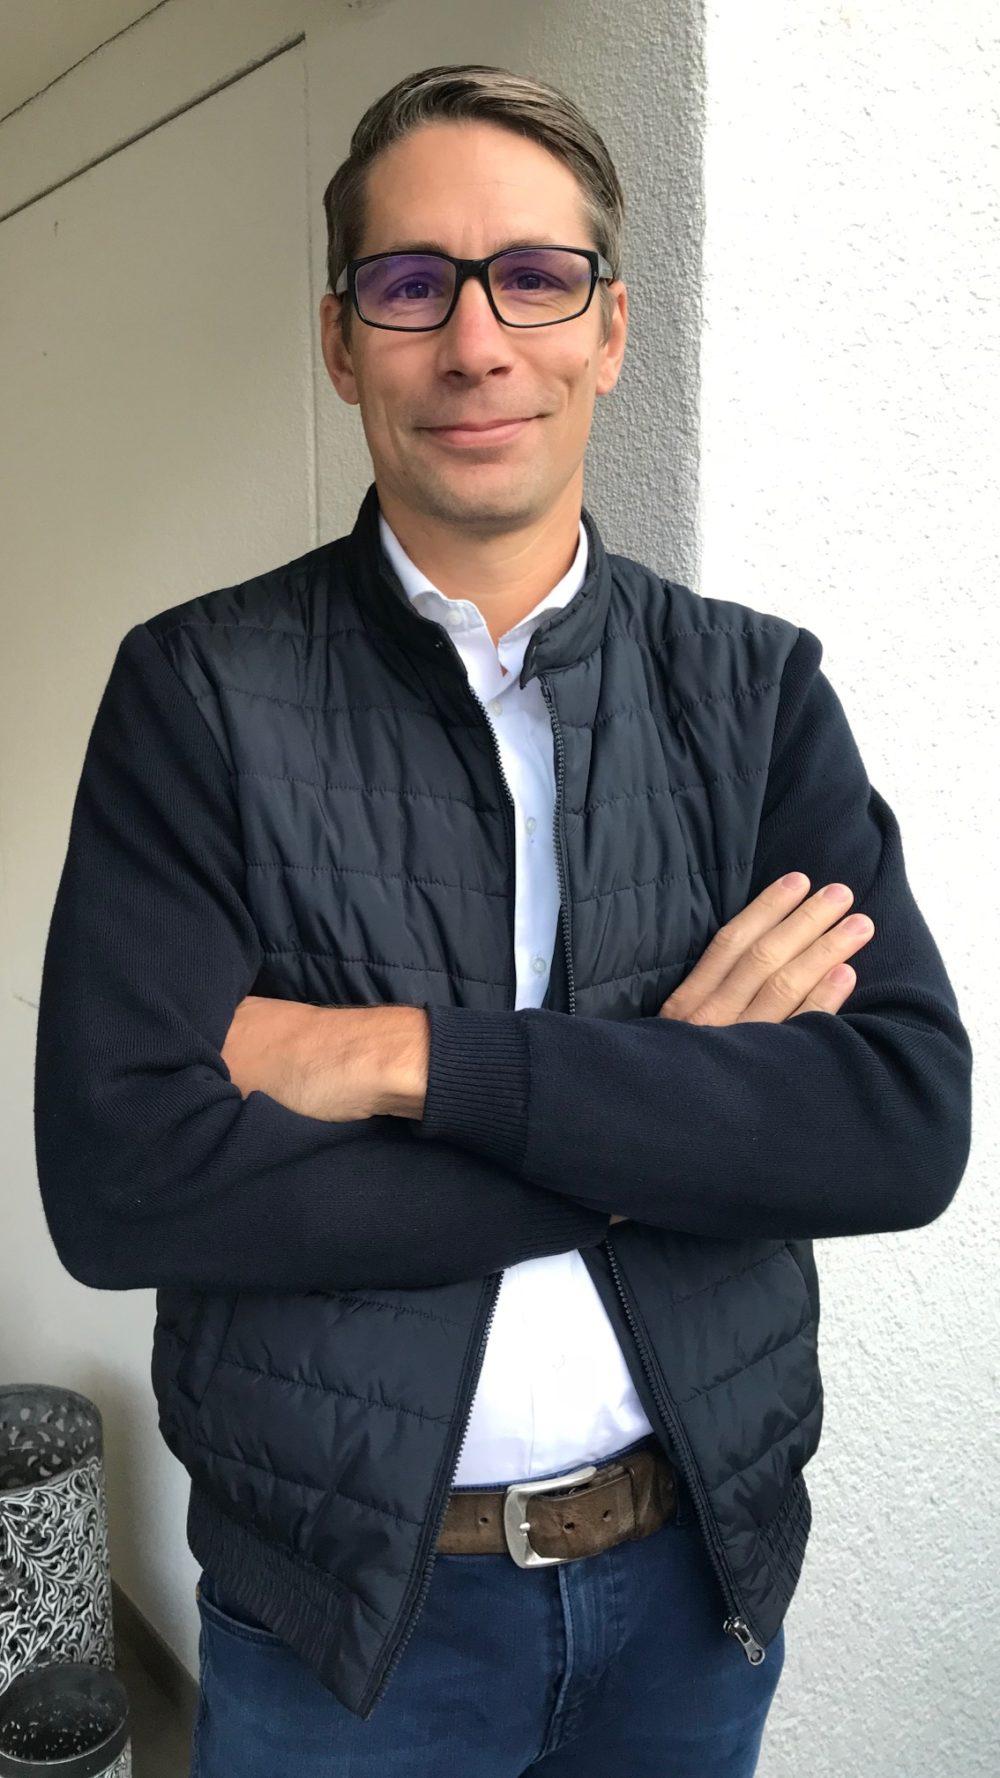 Martin Rüdisühli